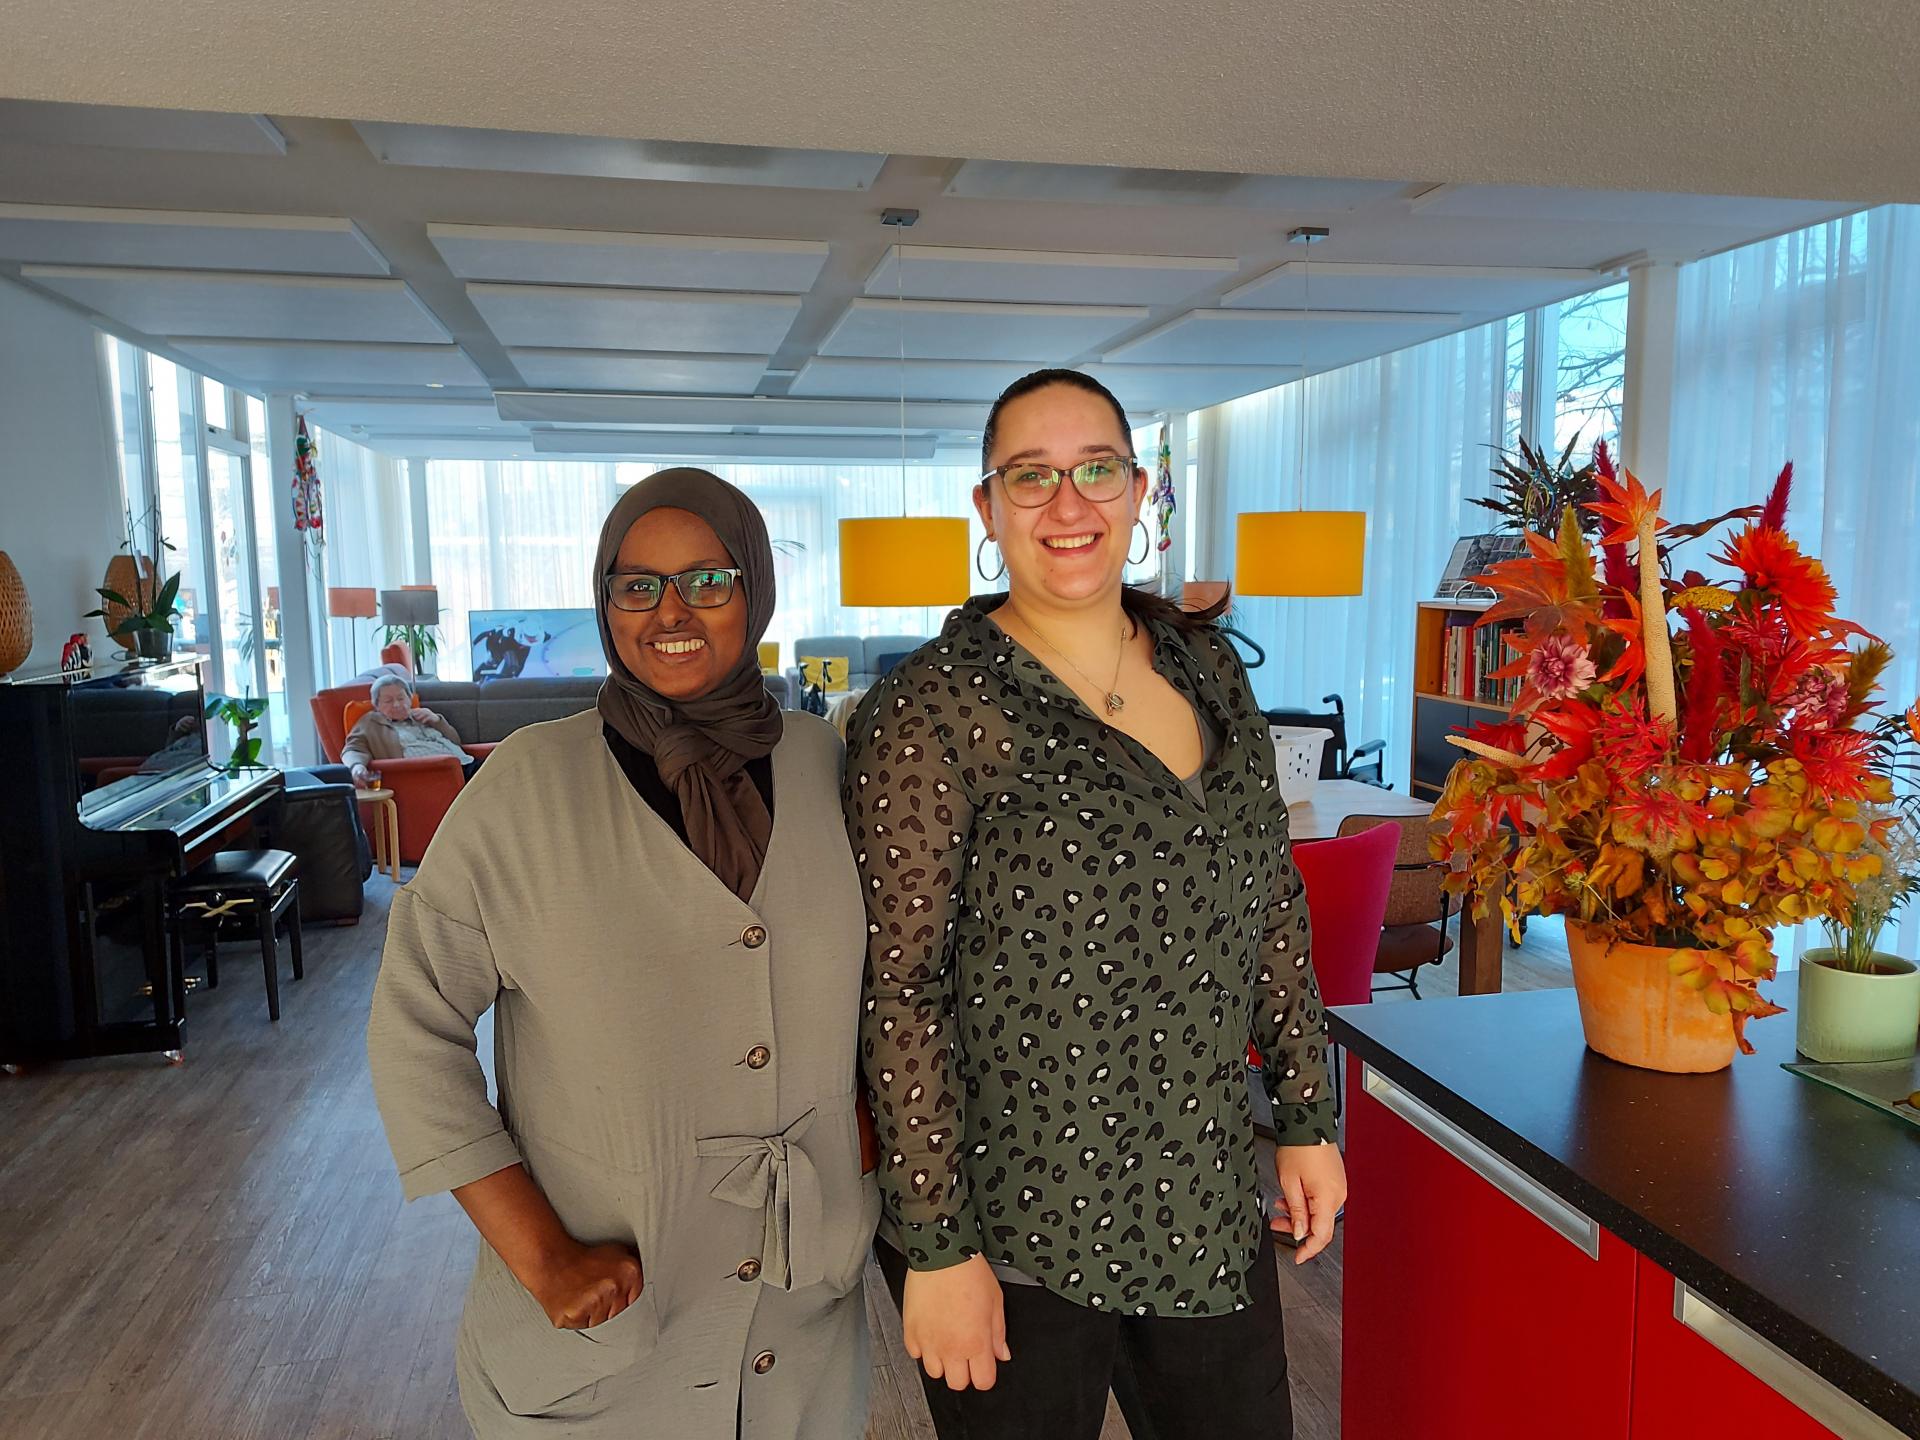 Herbergier biedt Shirley en Nimco een leerwerkplek - WSP Werkhart